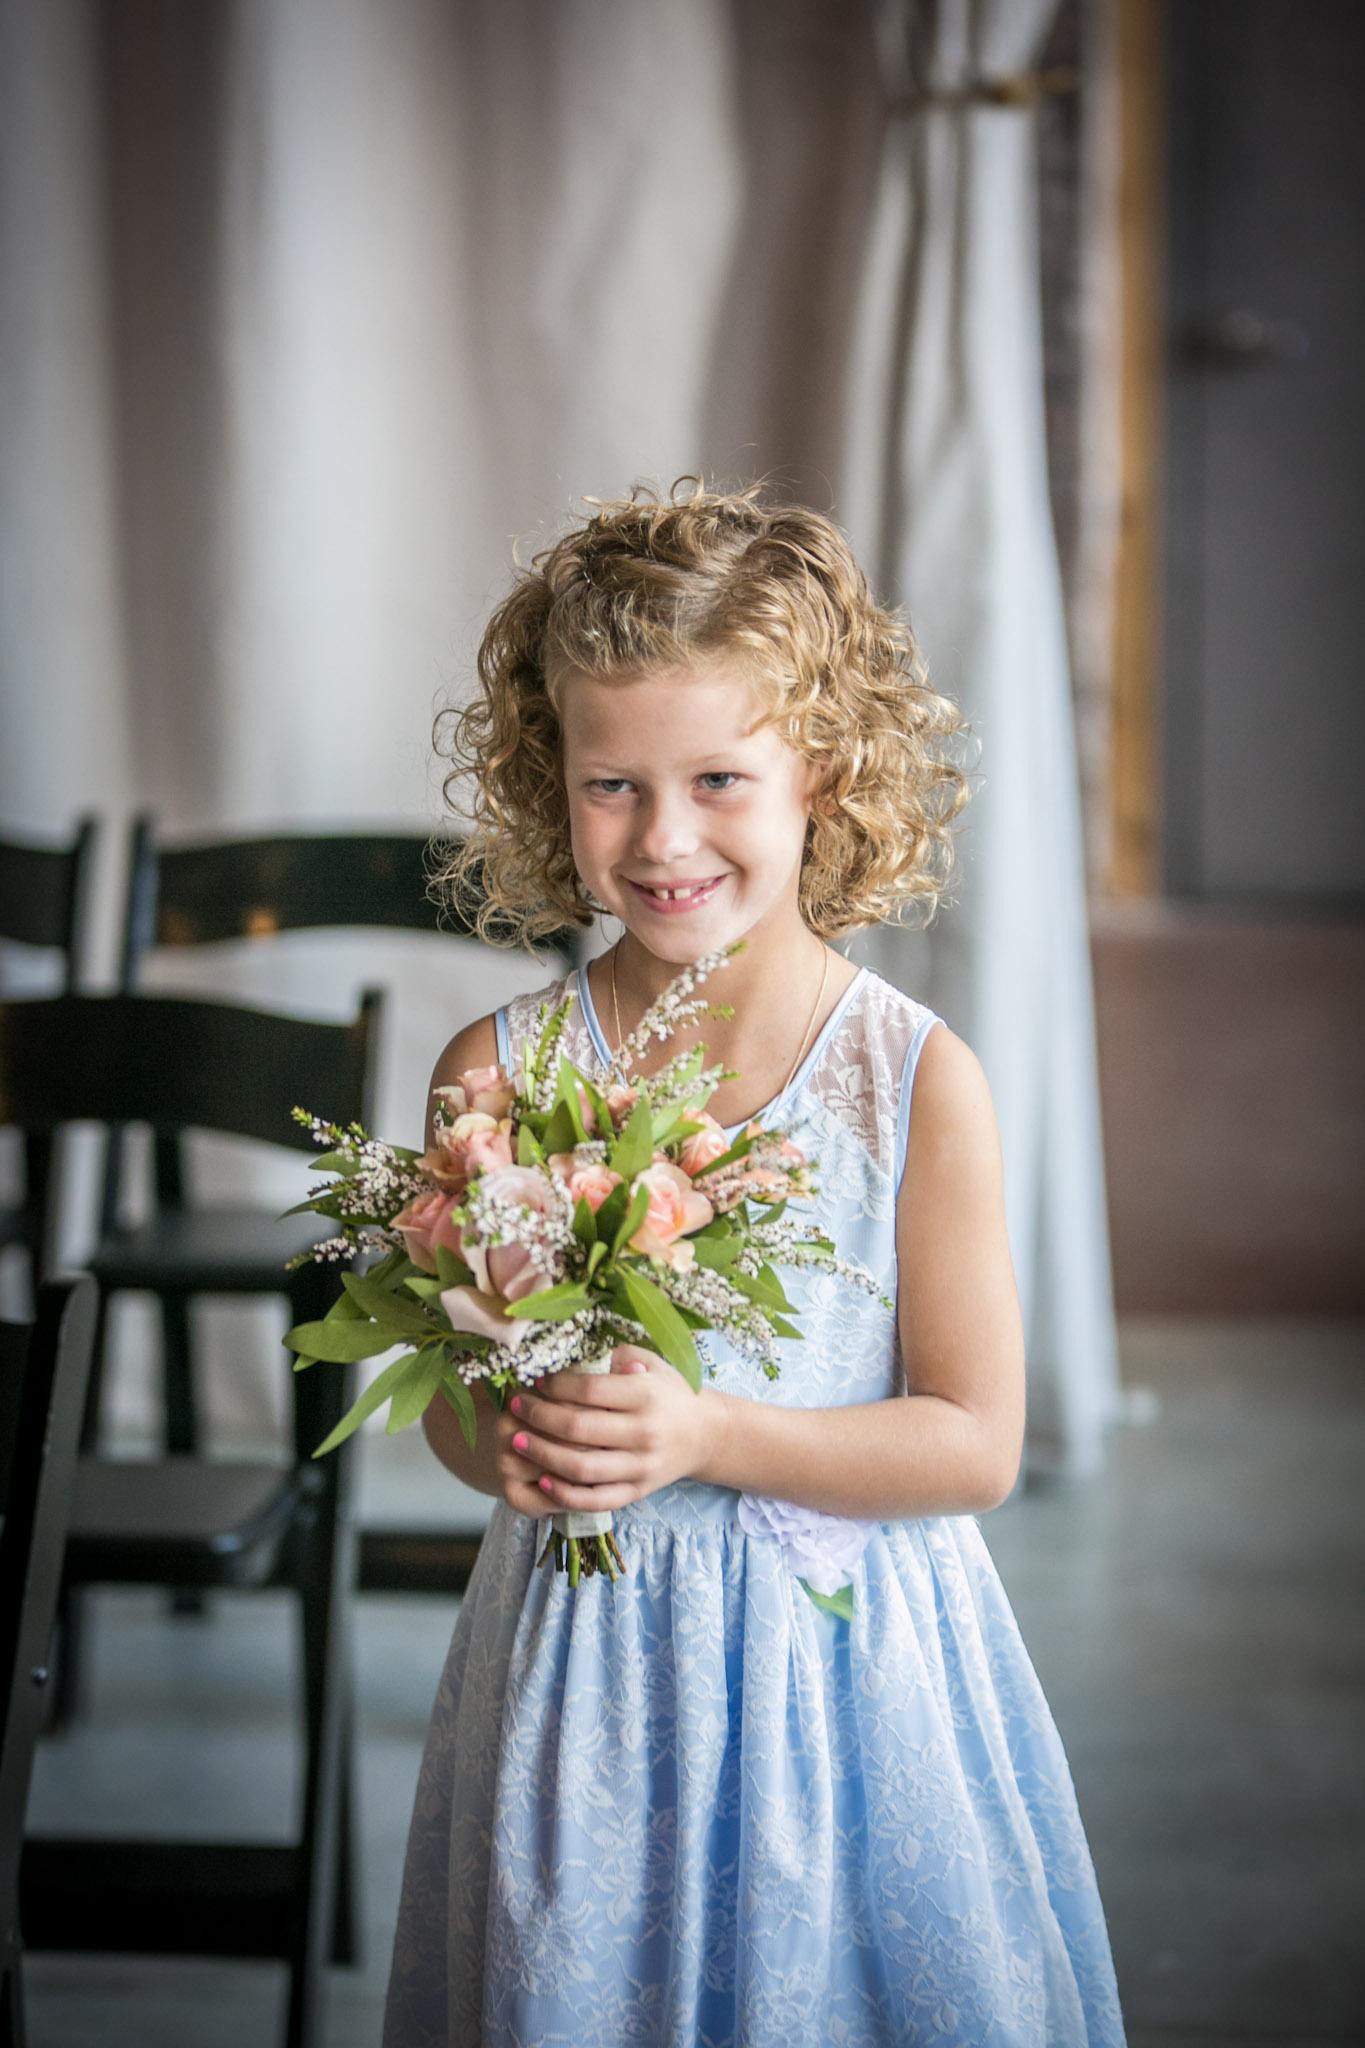 The_Vow_Exchange_Kansas_City_Small_Budget_Wedding_Venue_Lisa & John_037.jpg